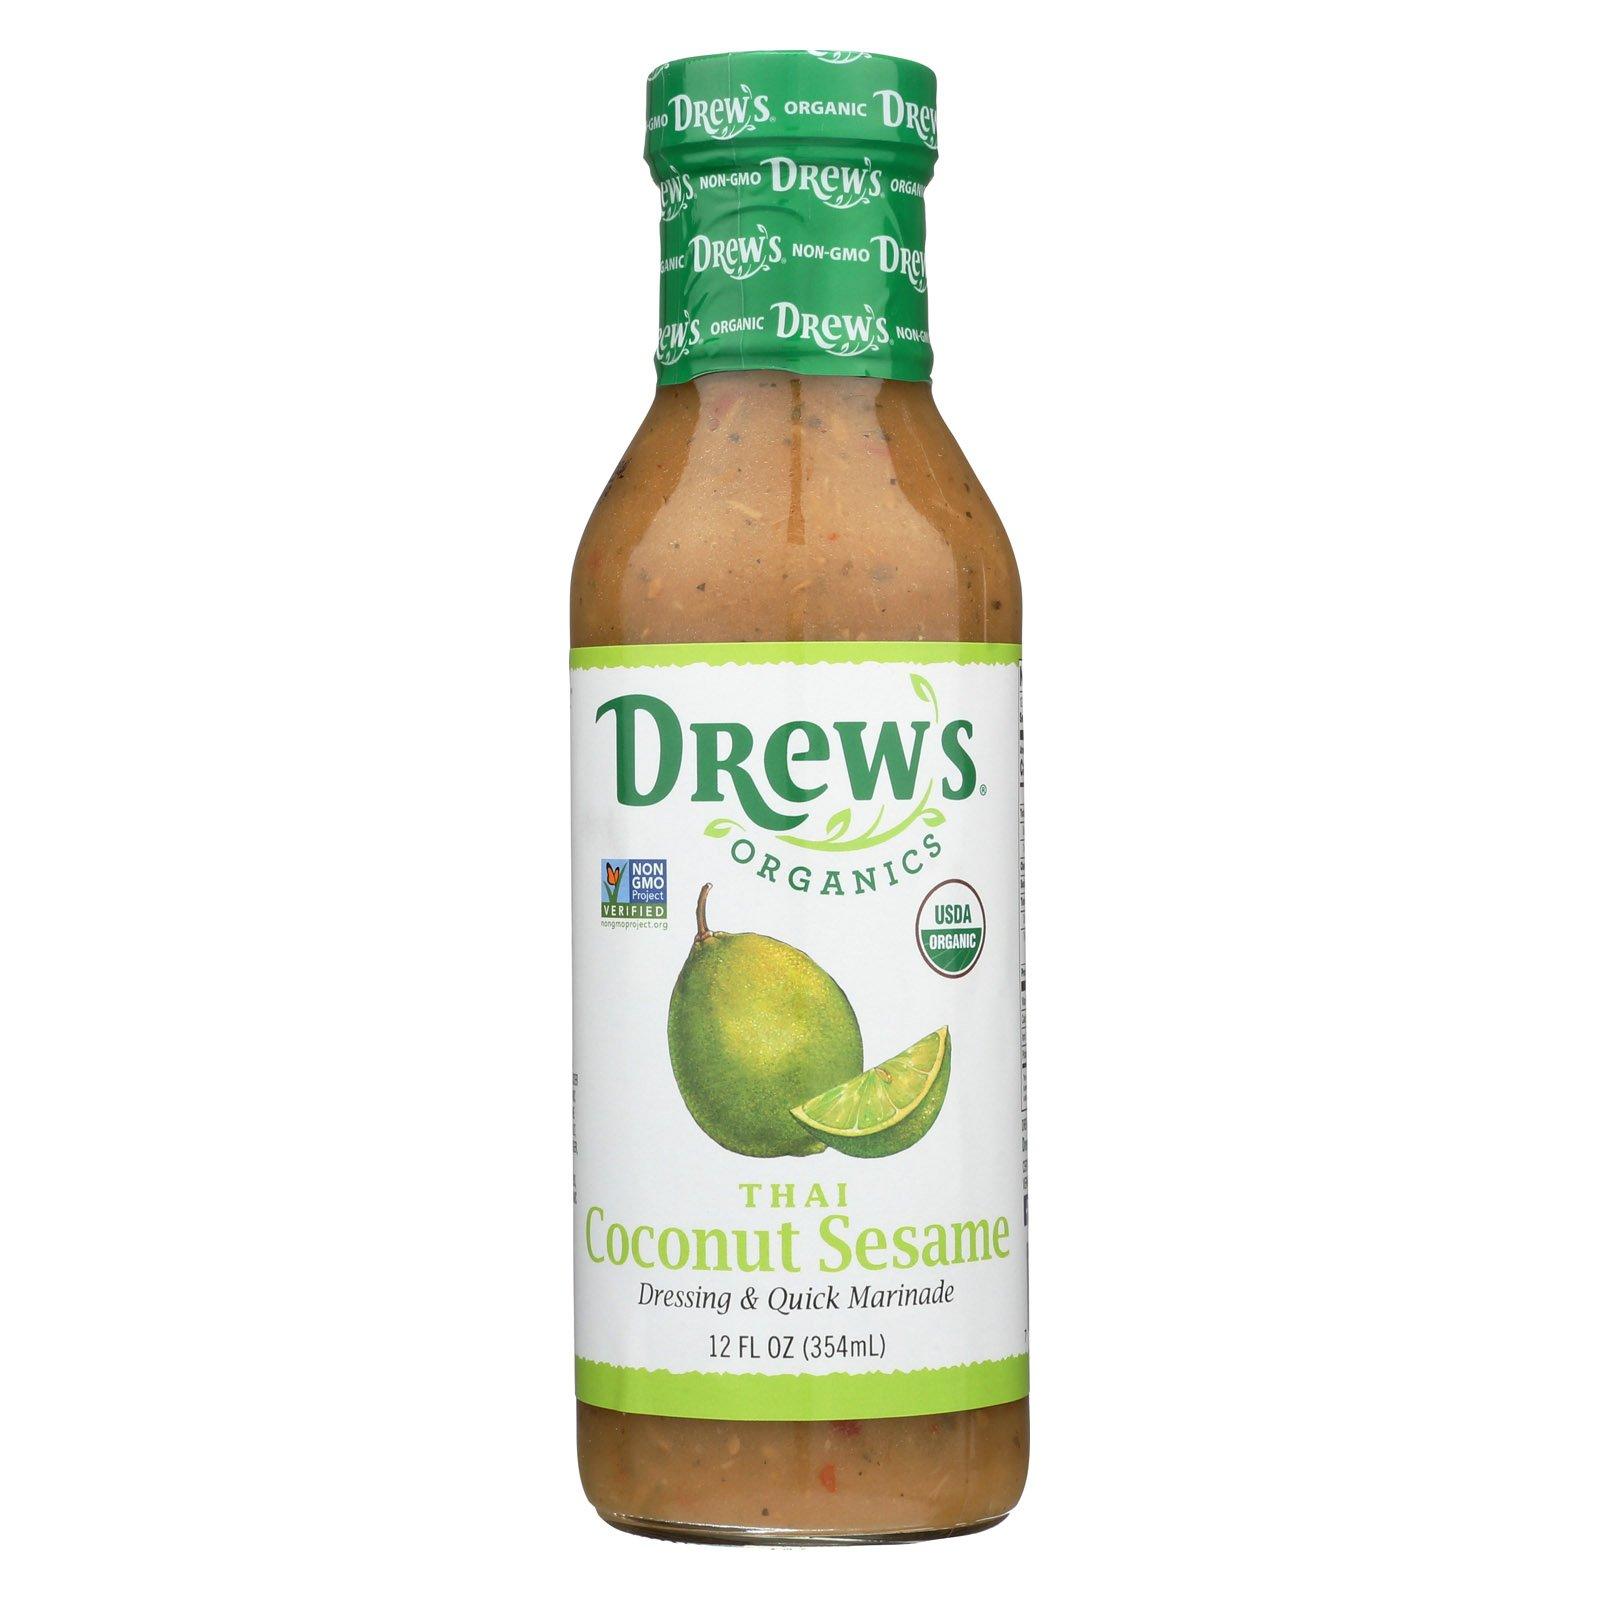 Drew's Organics Organic Dressing and Quick Marinade - Thai Coconut Sesame - 12 Fl. Oz. - Case of 6 by Drew's Organics